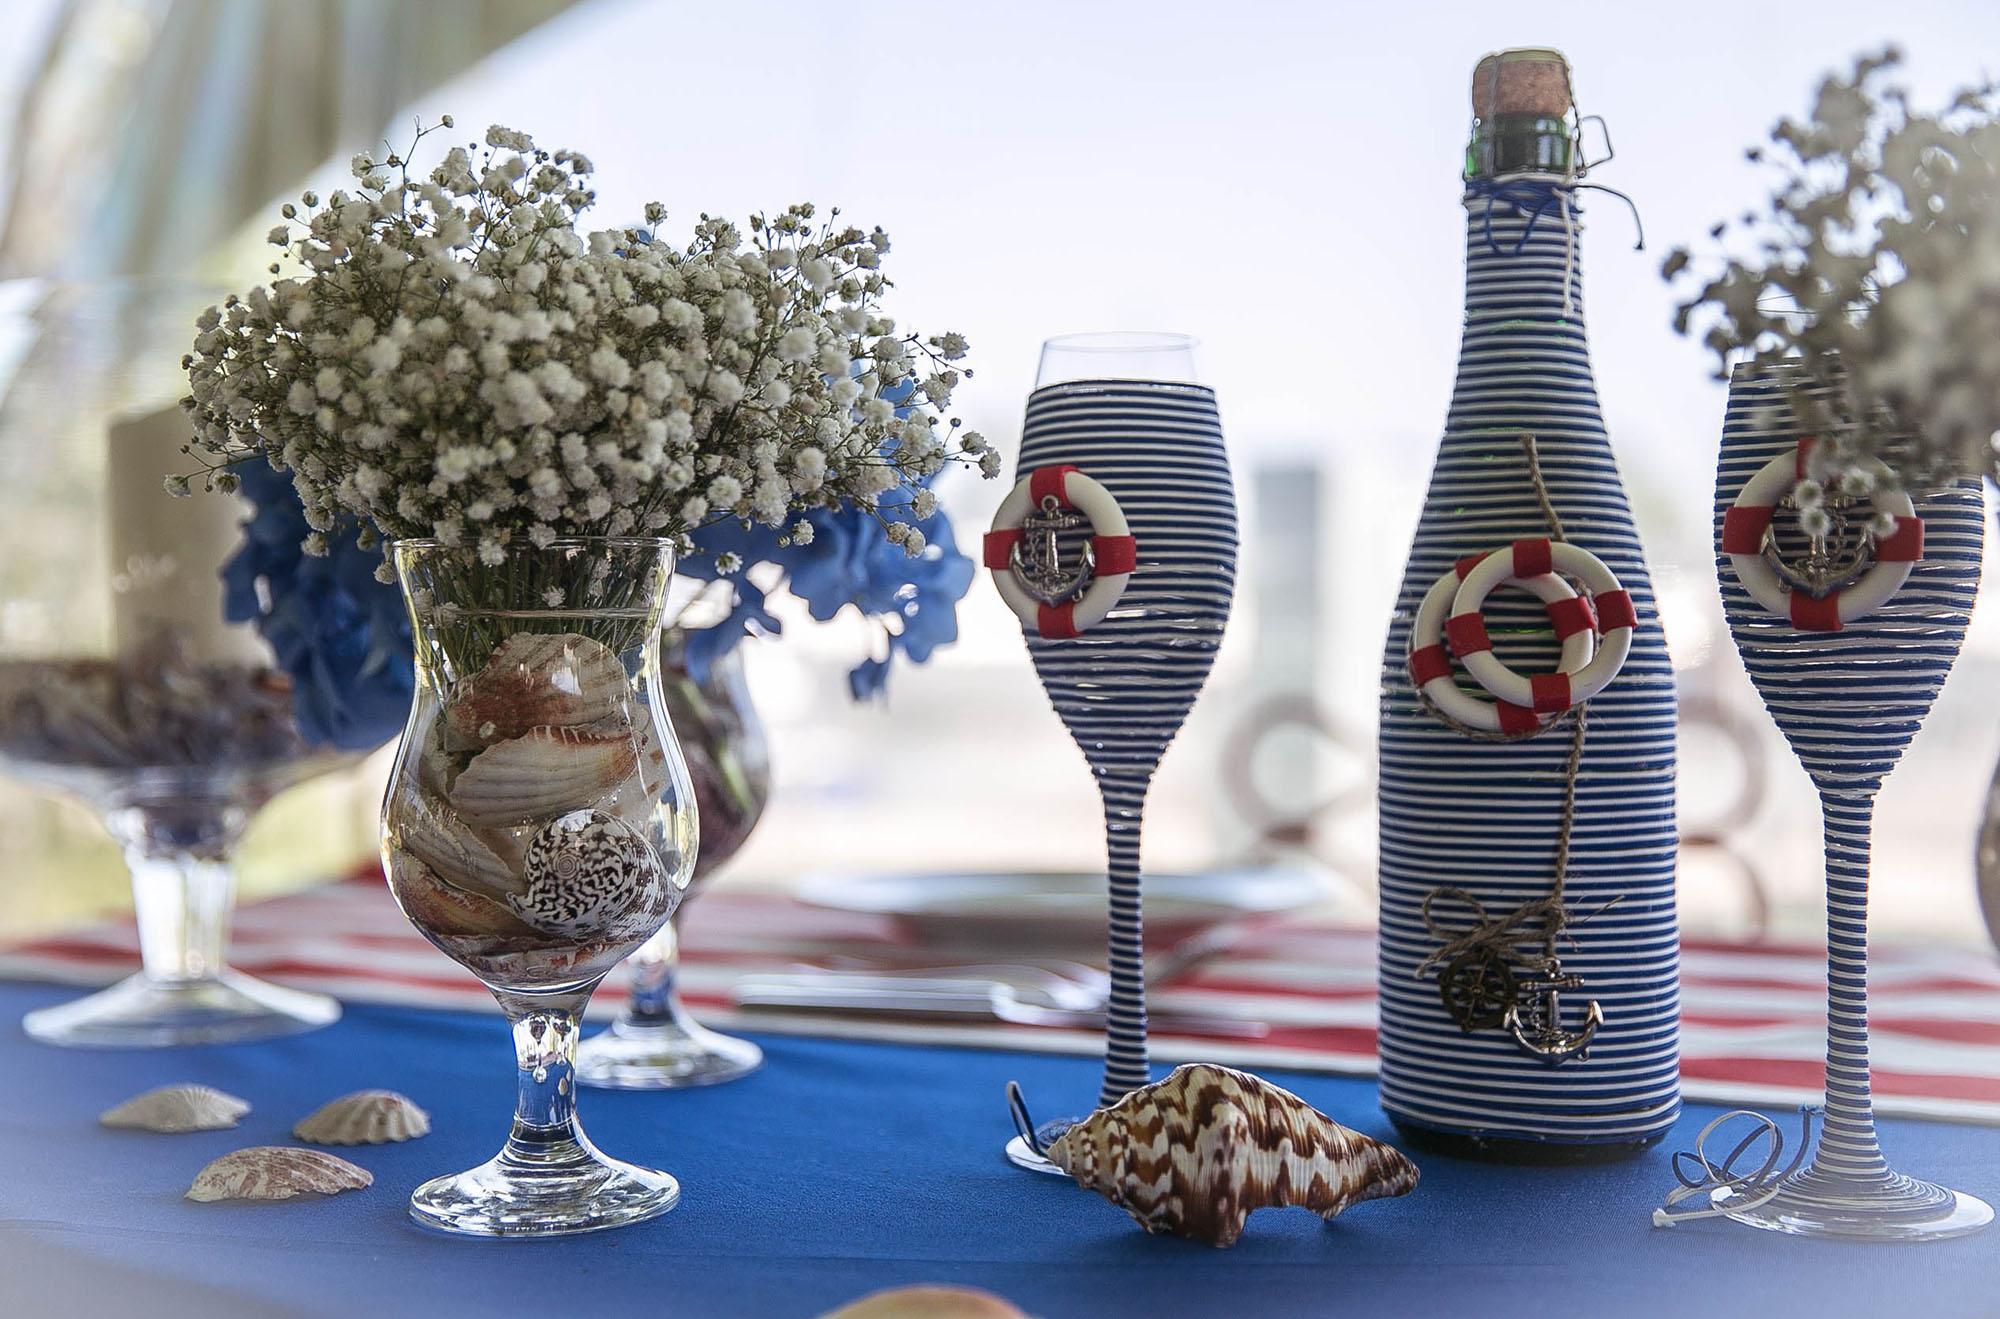 Декор бутылок в морском стиле